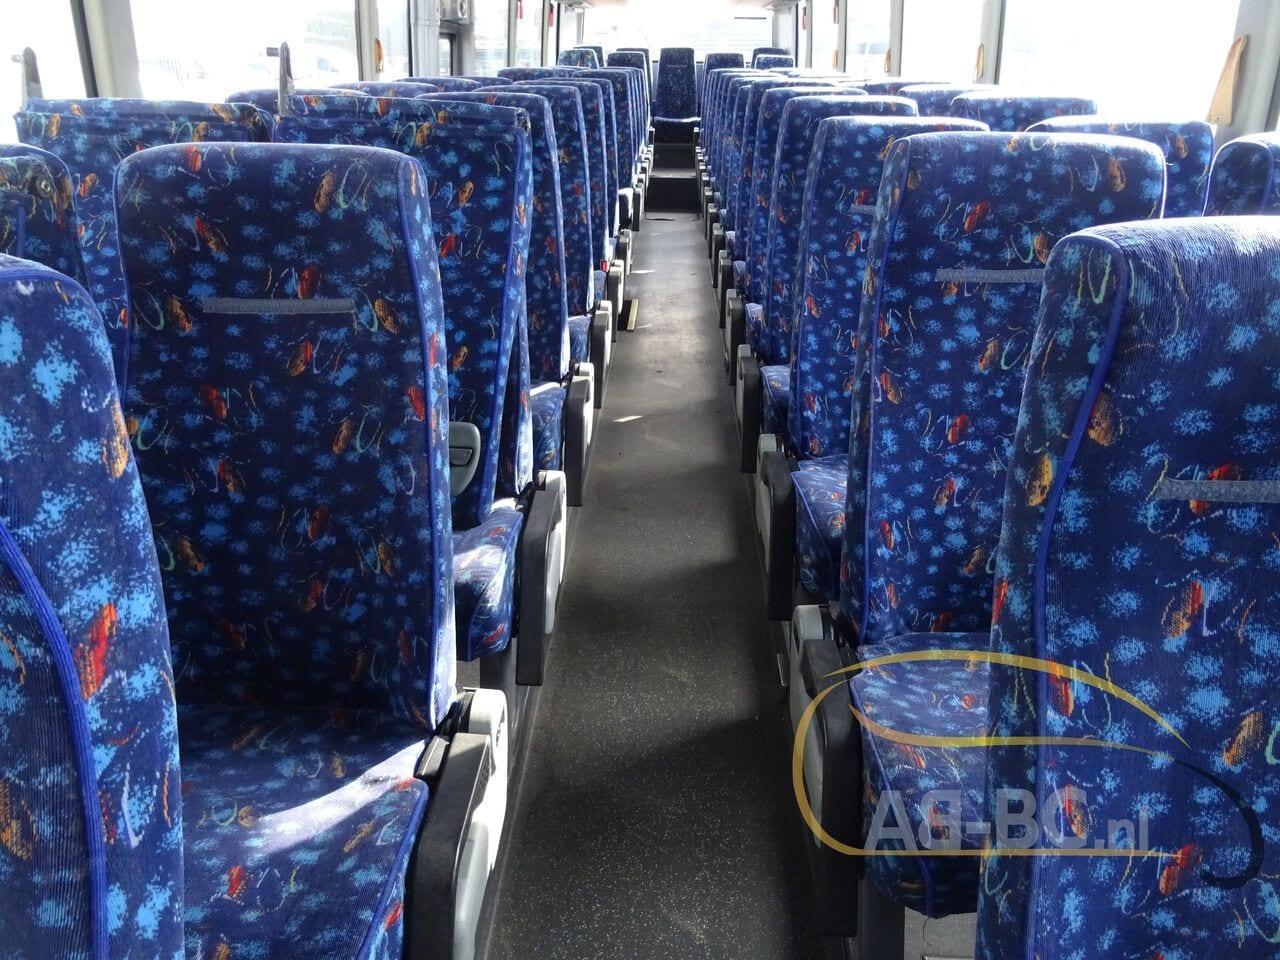 coach-busTEMSA-Safari-RD-65-Seats---1620311977207101506_big_1b7ac033e40379f411b2d5b87bf94a4e--21050617272795316700